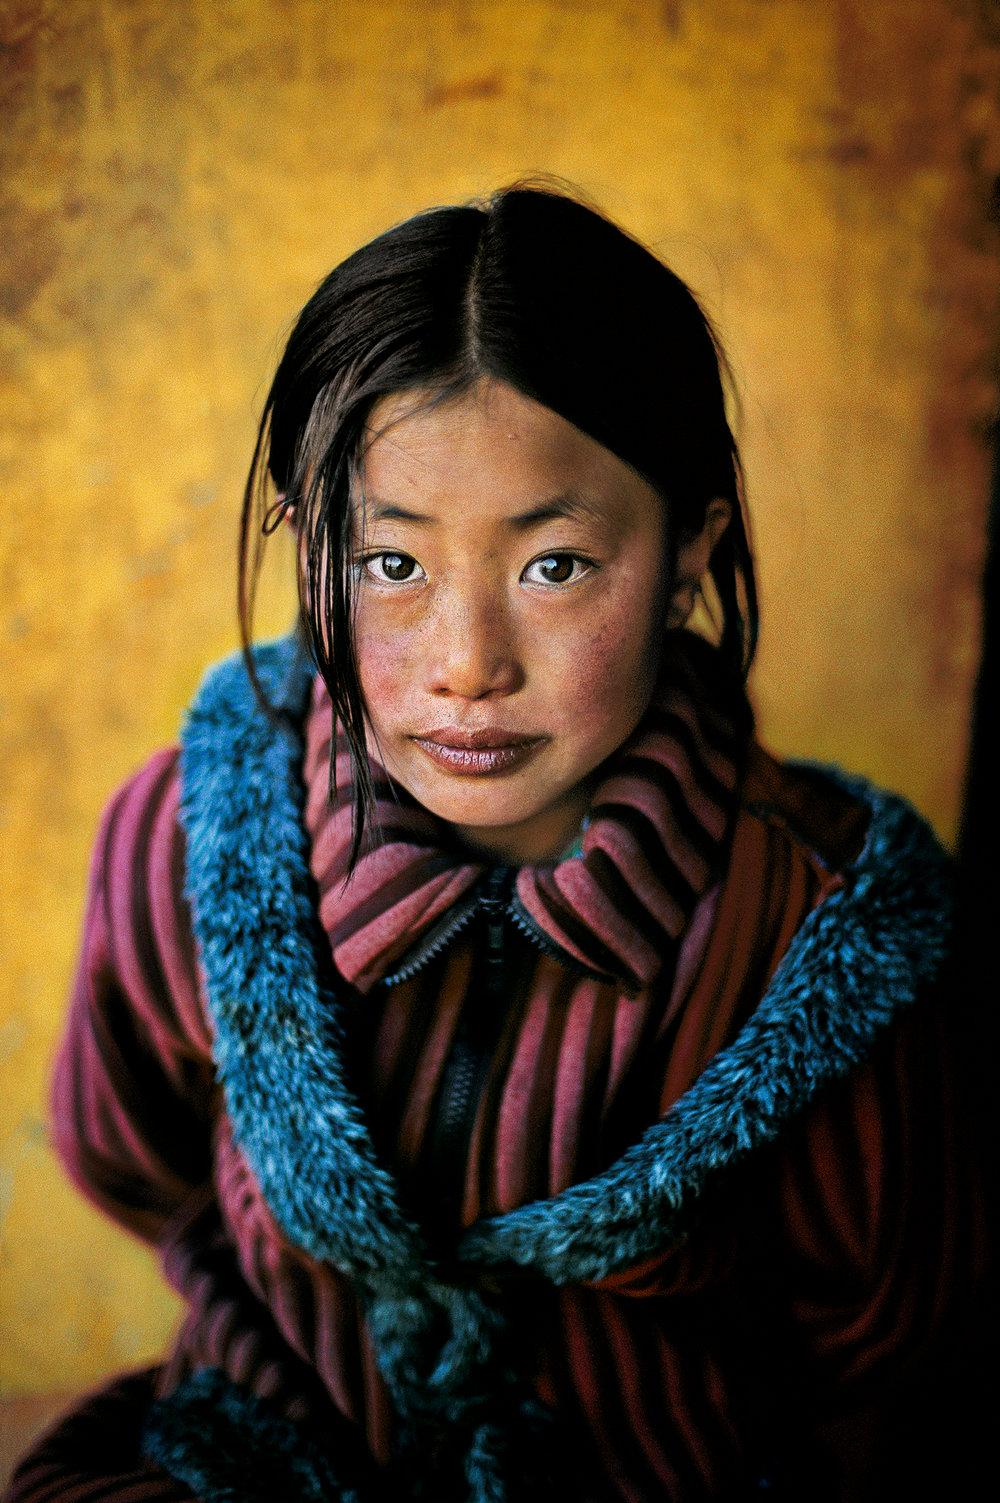 Xigaze, Tibet, 2001. ©Steve McCurry